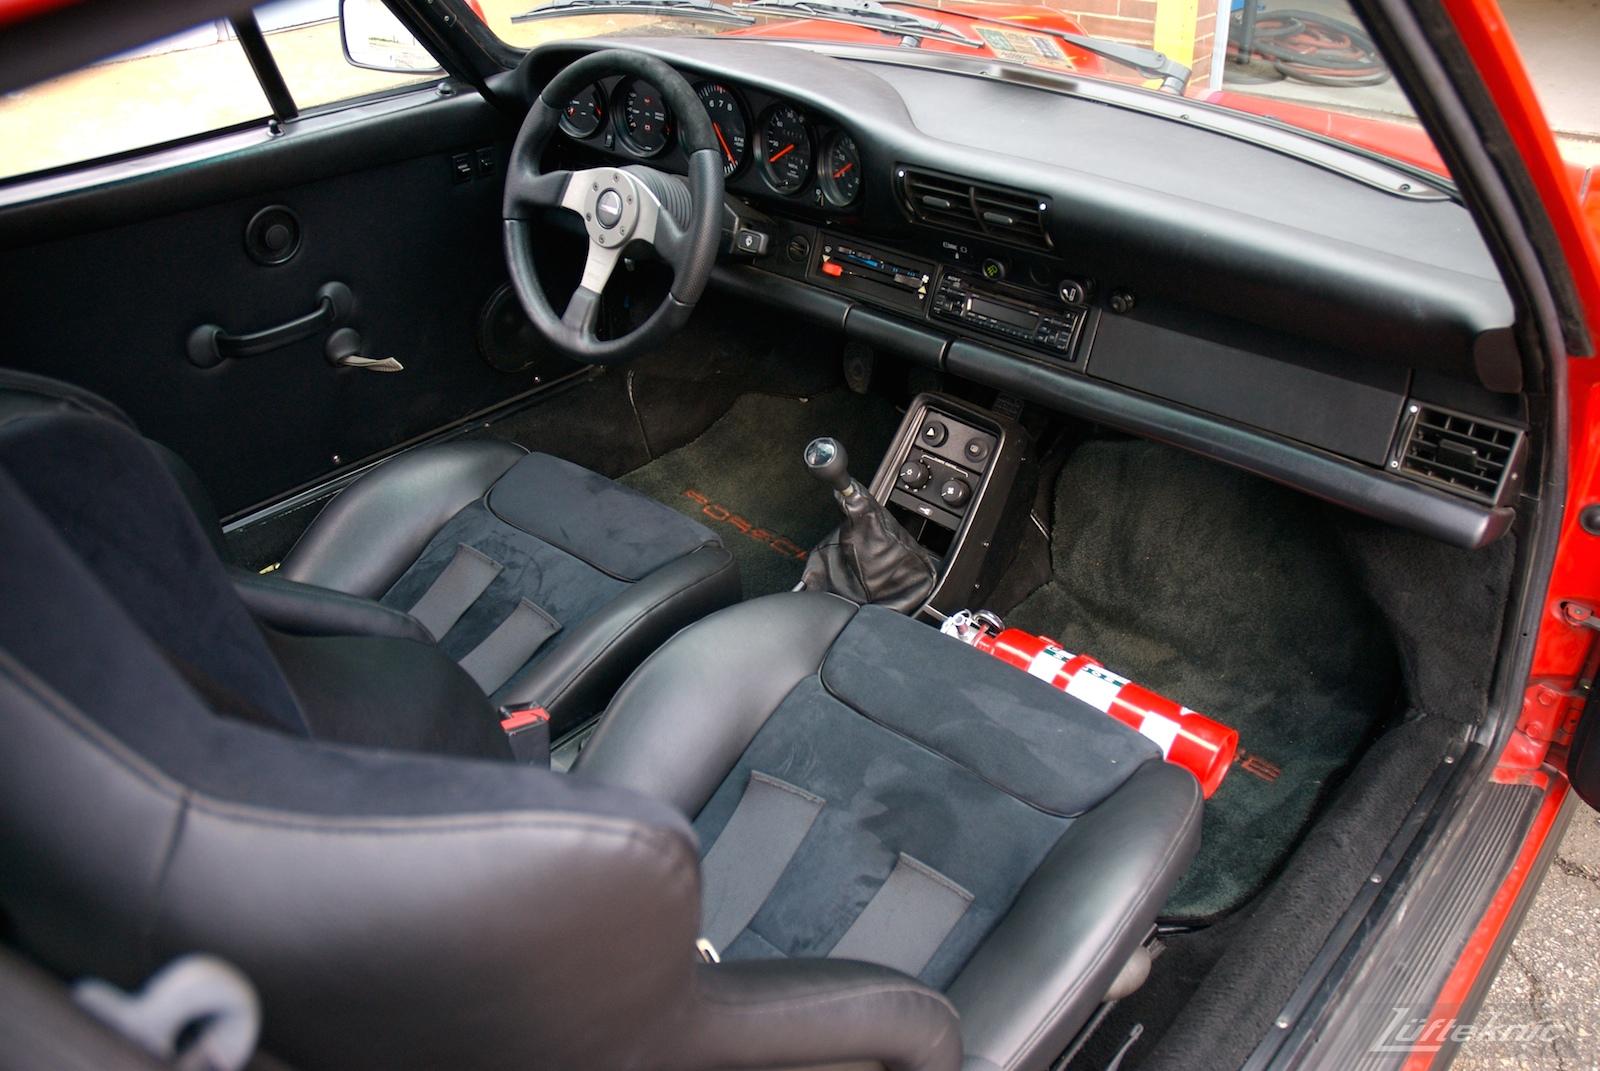 Red Porsche 930 Turbo interior.